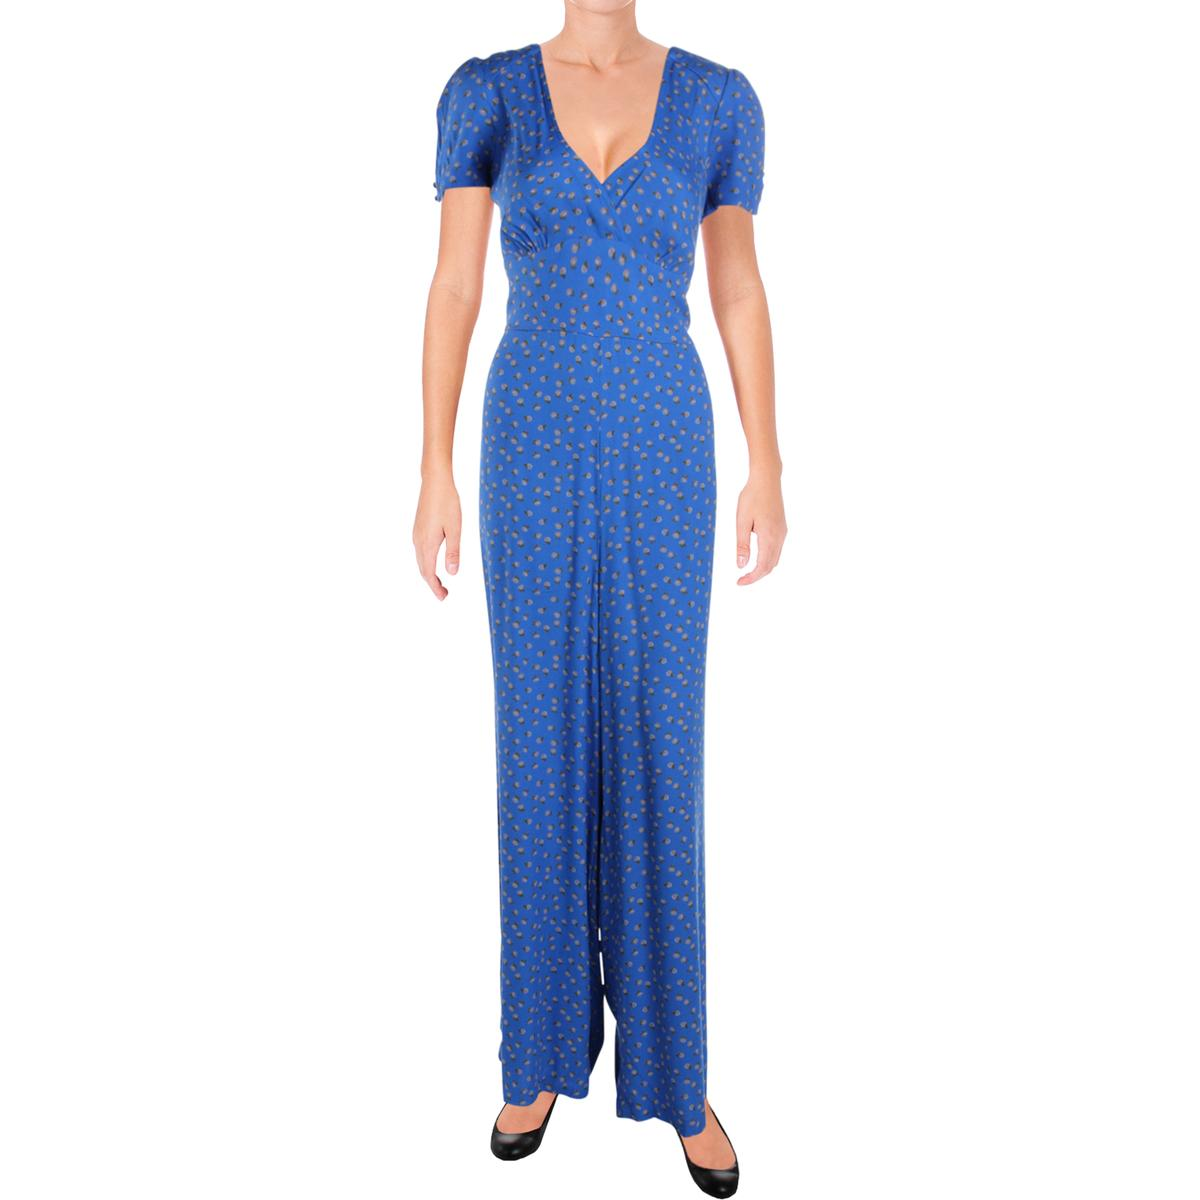 e6fcacc0db56 Details about Free People Womens Mia Blue Empire Waist Wide Leg Jumpsuit 2  BHFO 9240